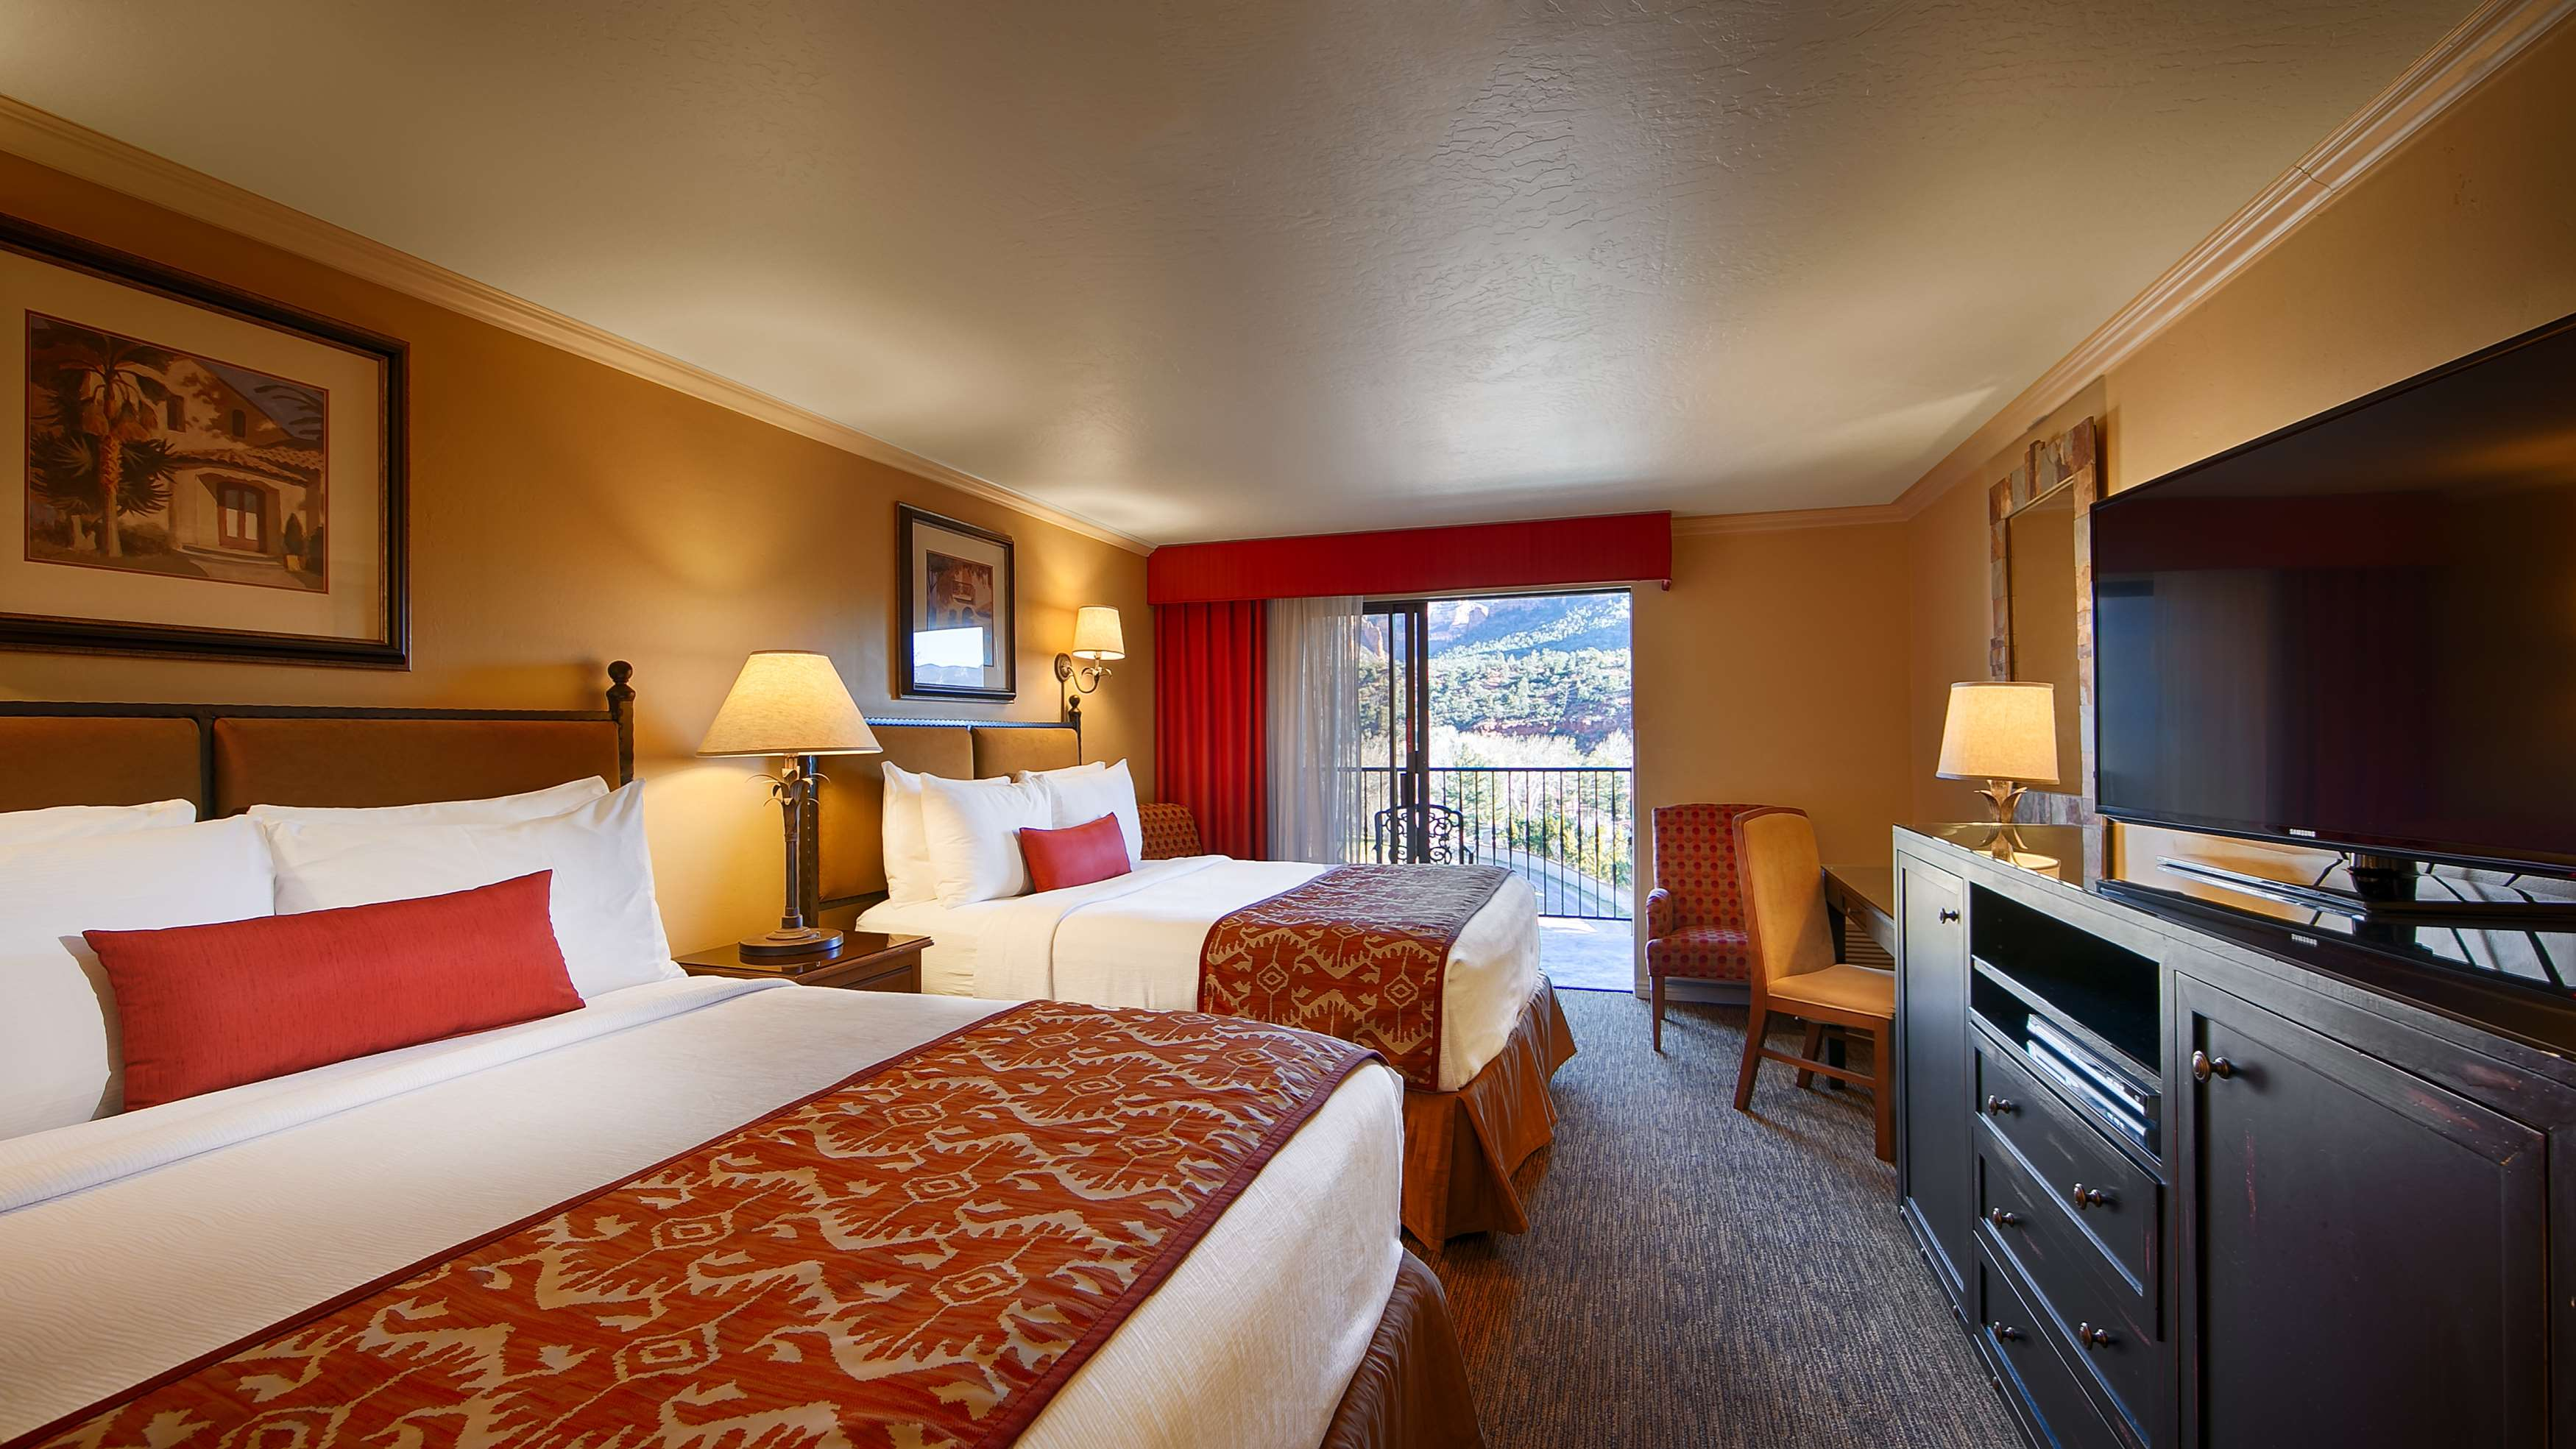 Best Western Plus Arroyo Roble Hotel & Creekside Villas image 47